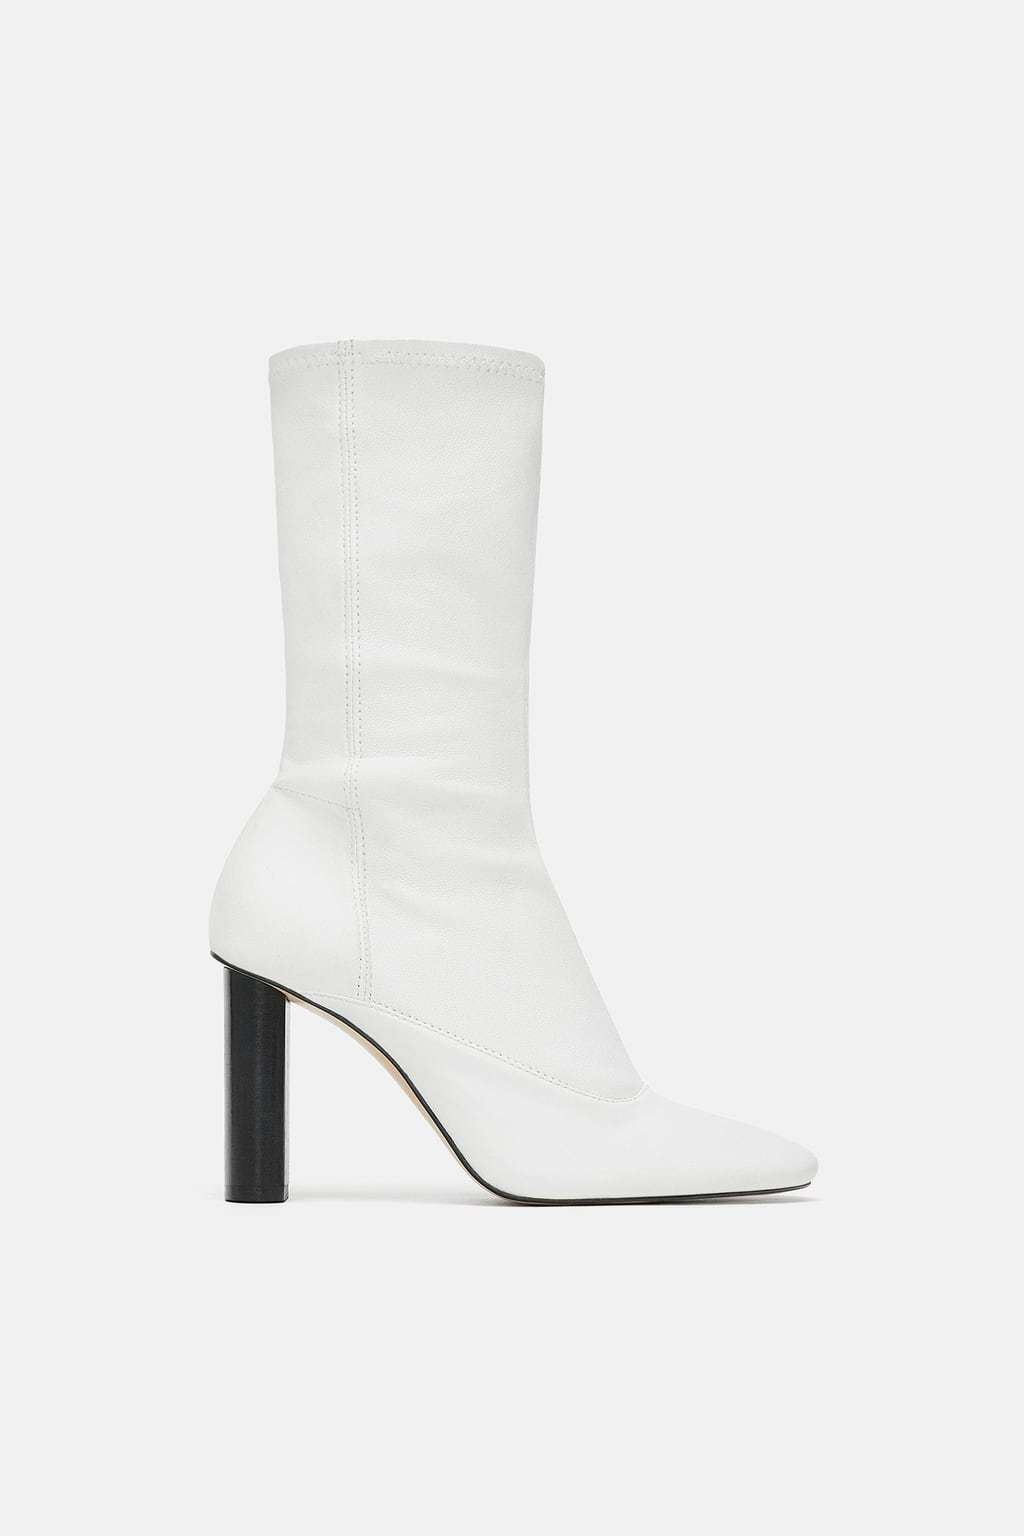 Saldi Zara 2019, acquista responsabilmente!